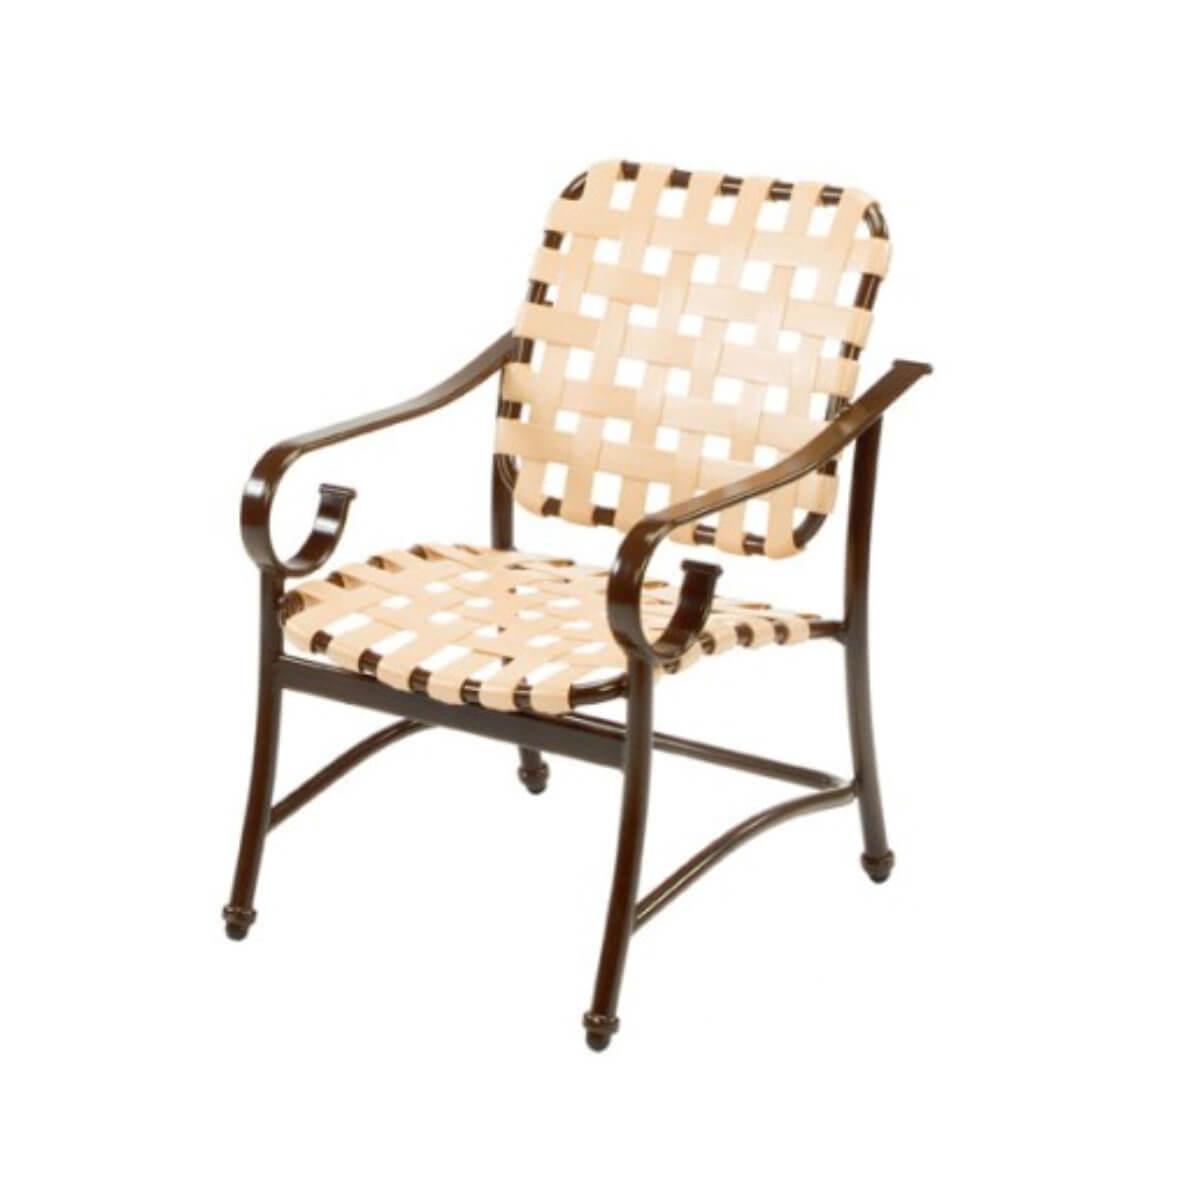 Dining Chair Crossweave Vinyl Strap Aluminum Frame Pool